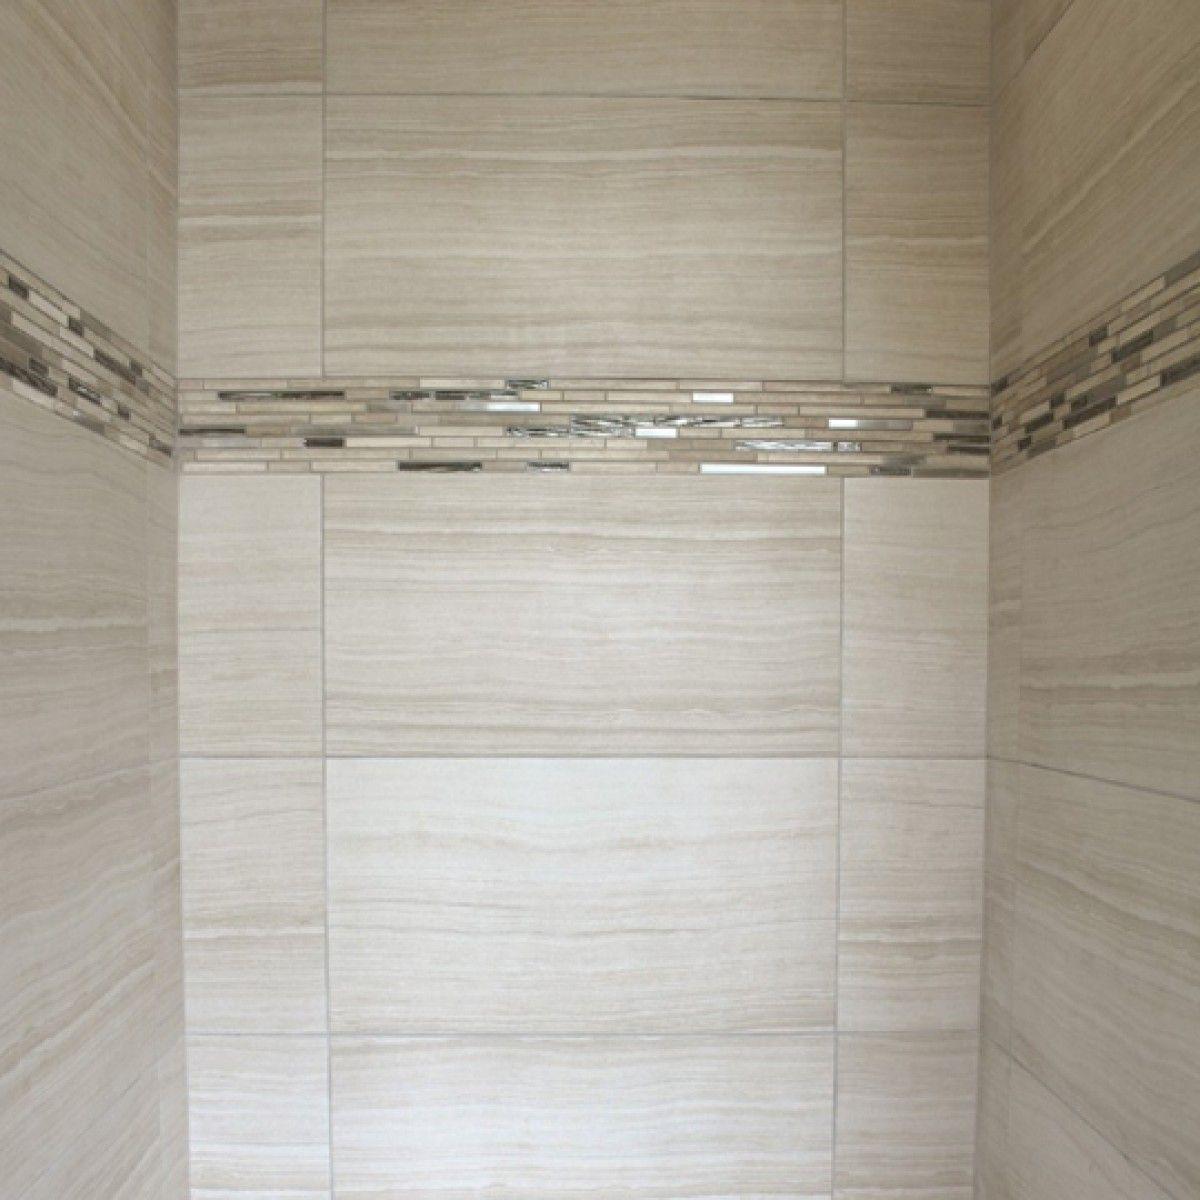 Wickes Basaltina White Porcelain Floor Tile 600x600mm   Wickes.co.uk ...